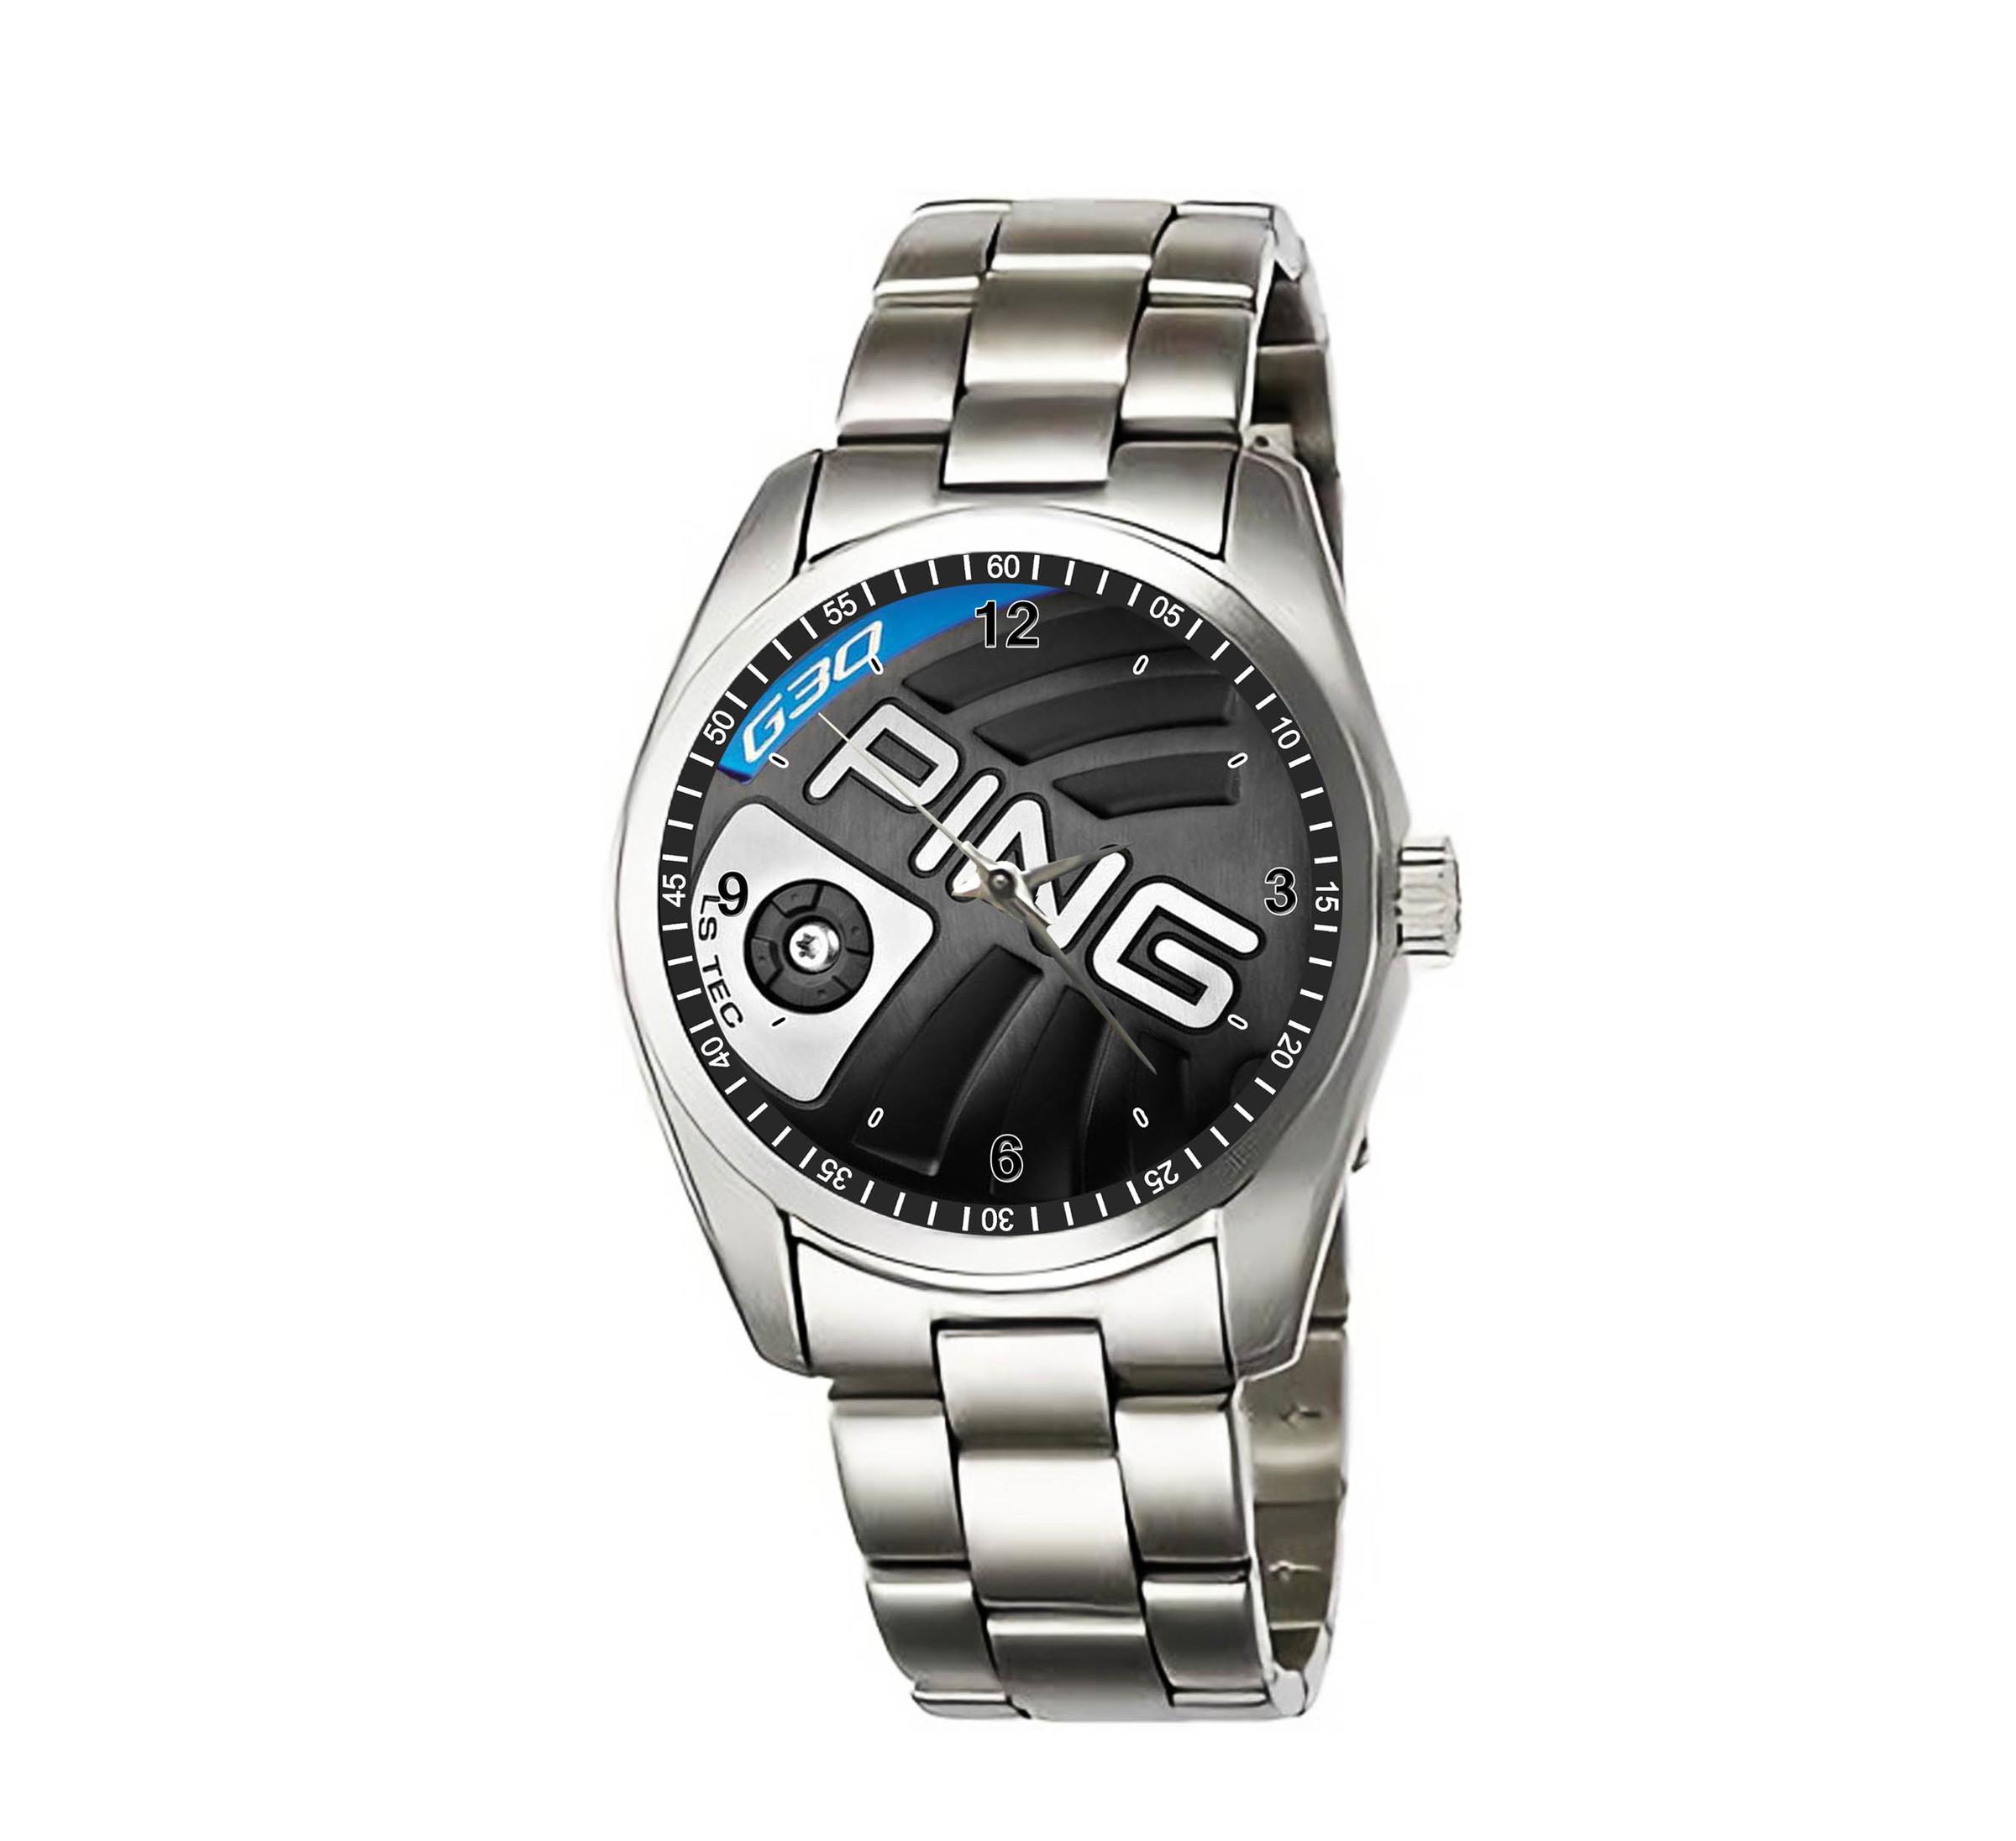 Ping G30 LS Tec Driver Golf Clubs Sport Metal Watch Golf.jpg